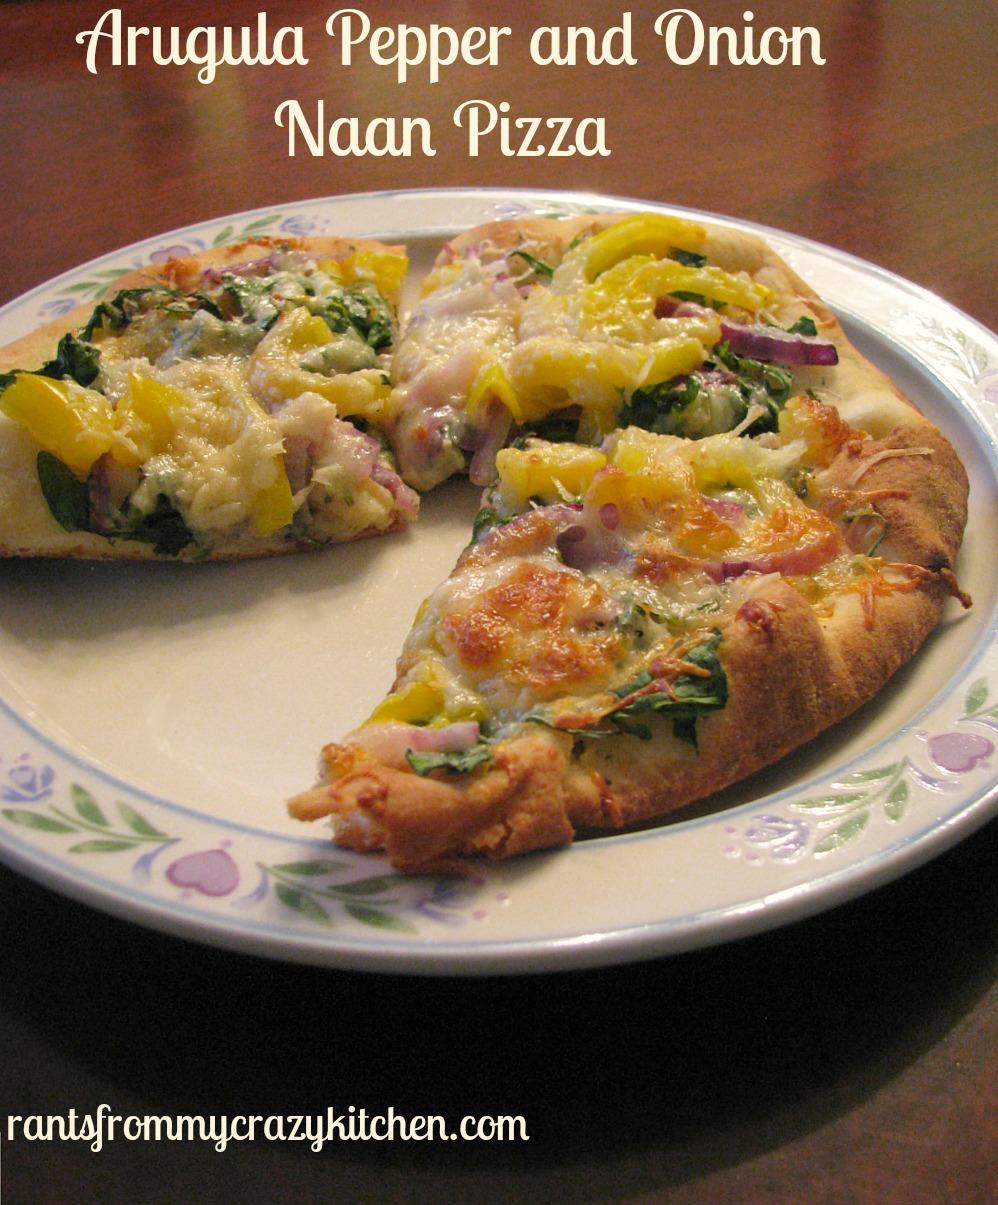 Arugula Pepper and Onion Nann Pizza